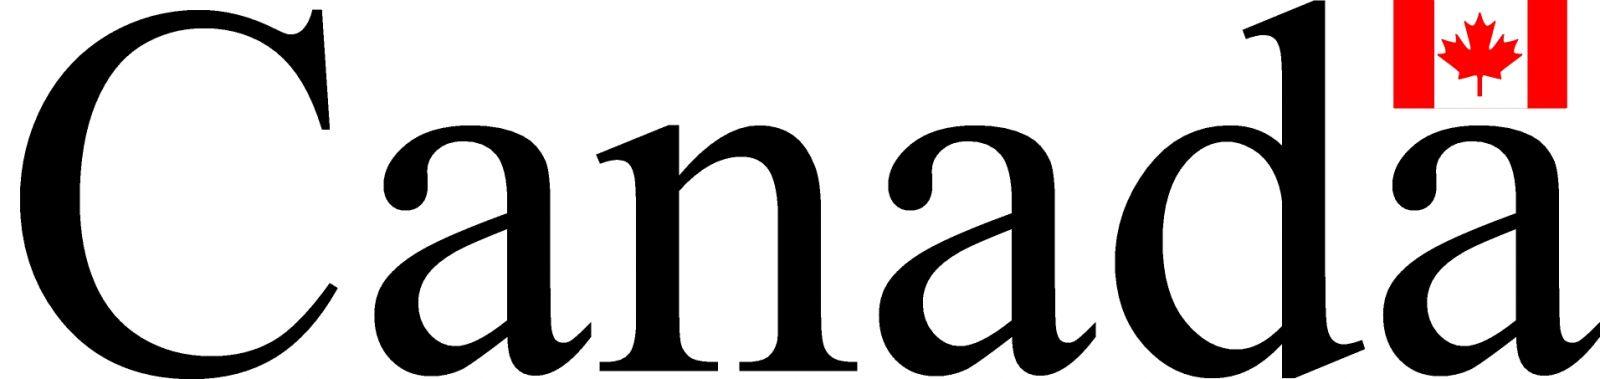 Canada-wordmark(1).jpg